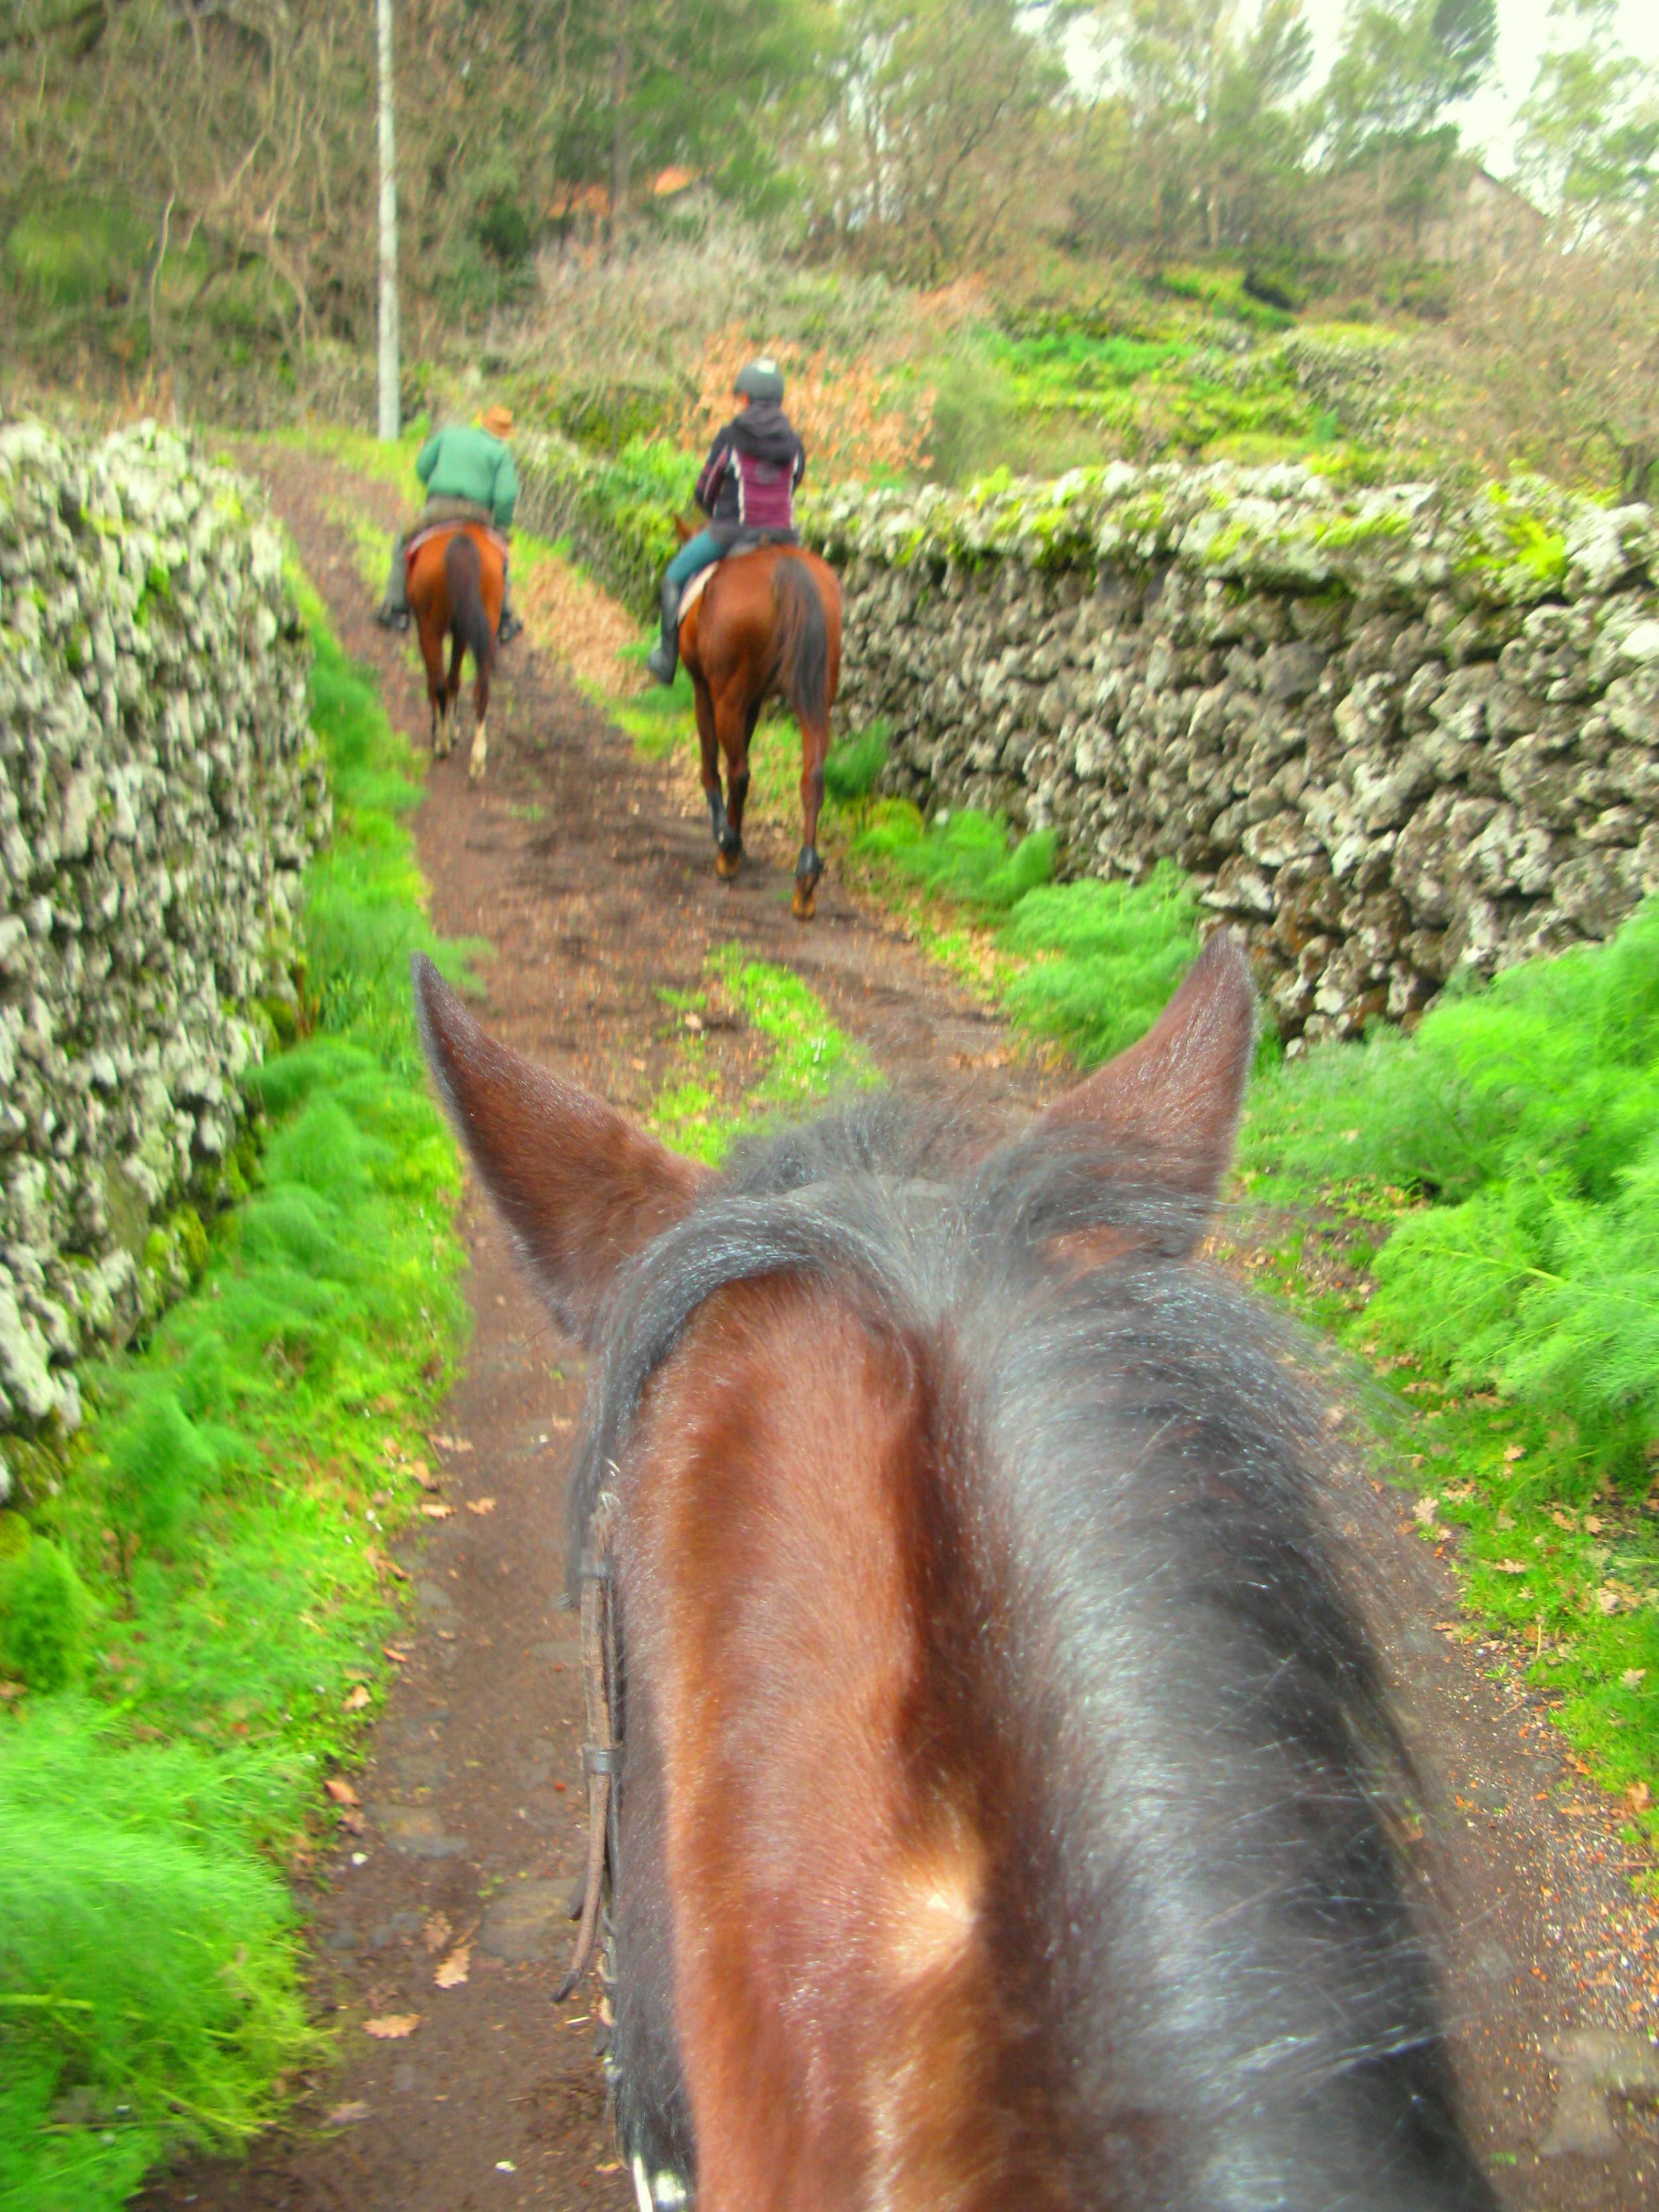 Among the vineyards on horseback